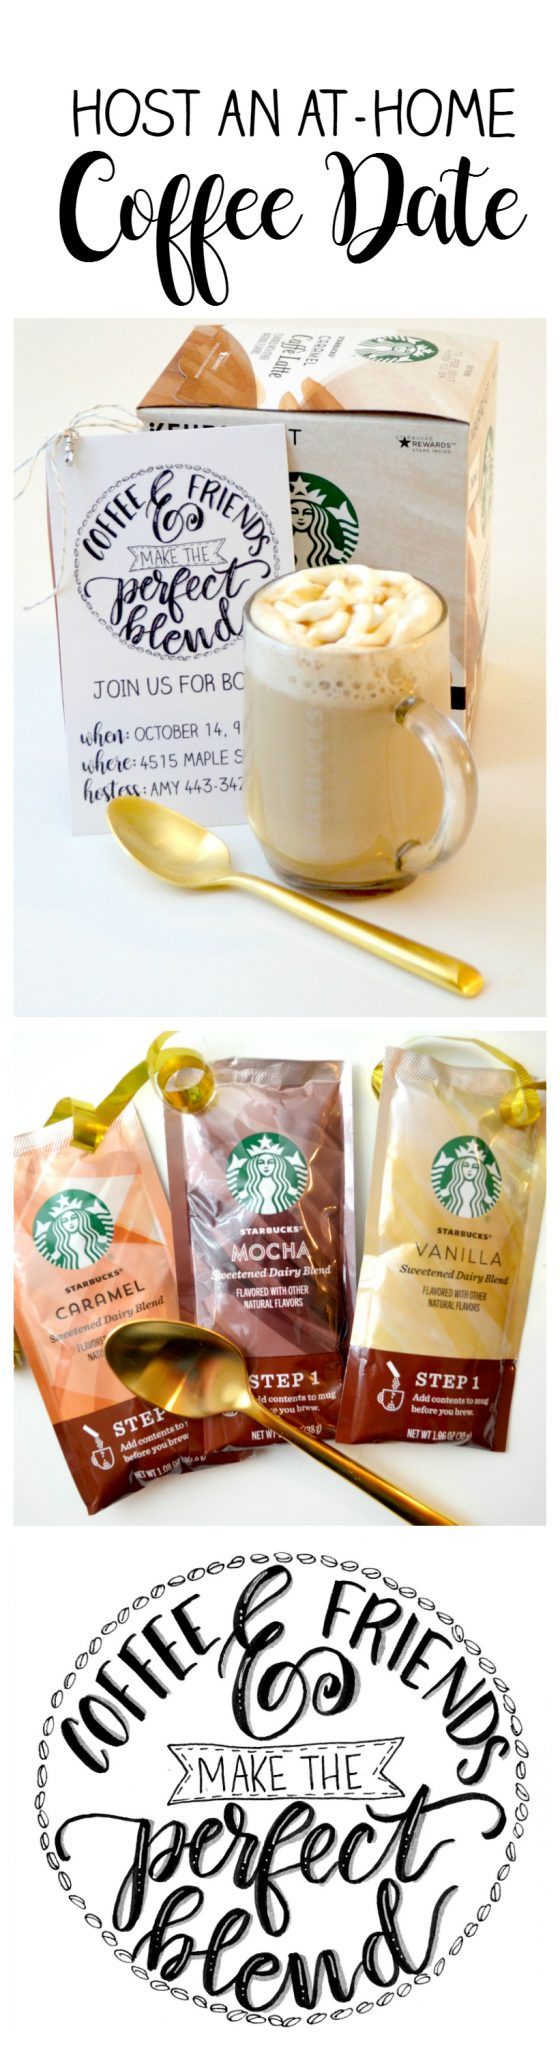 Starbucks Caffe Latte K-Cup Pods